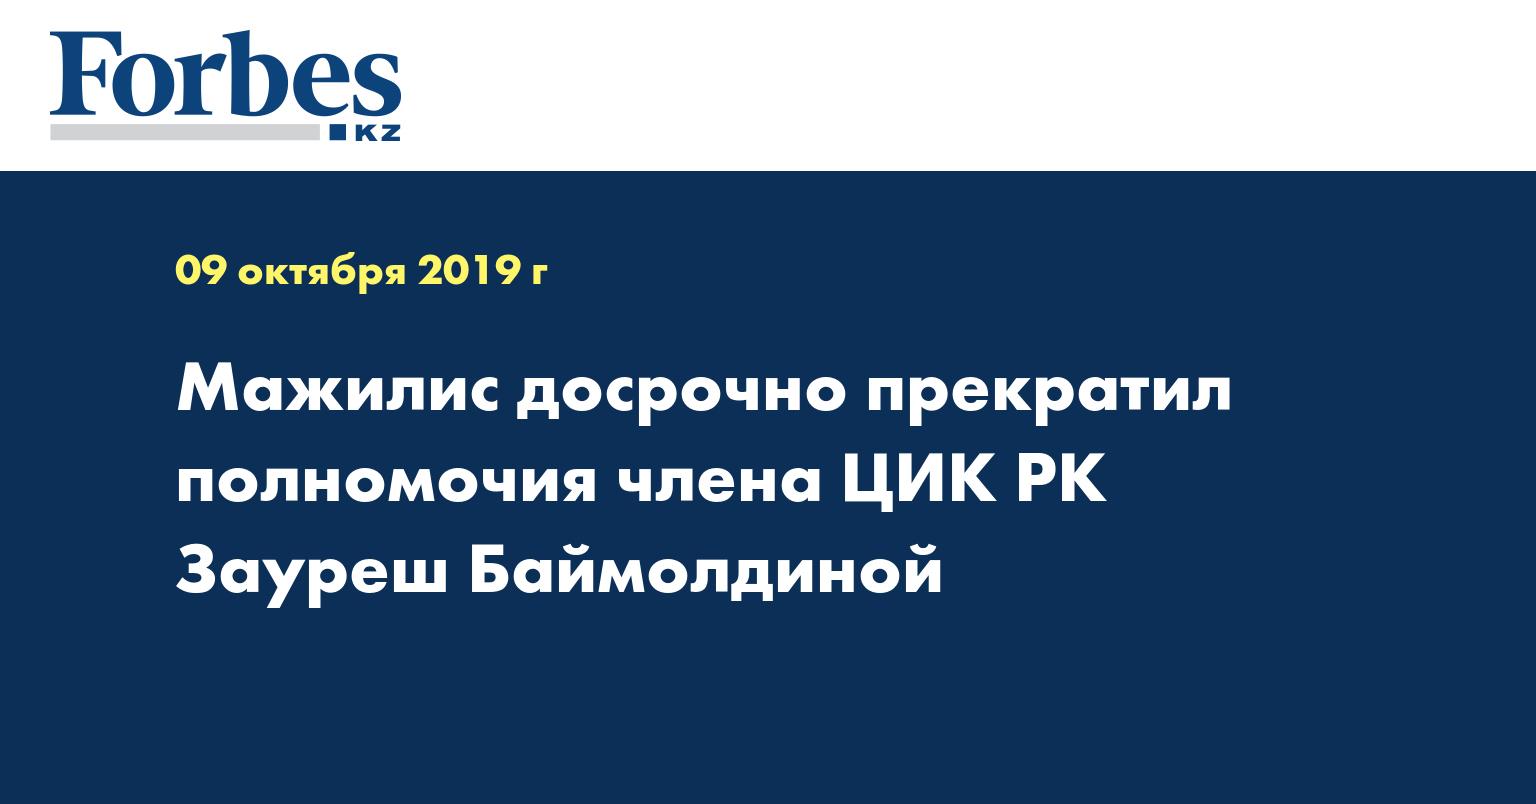 Мажилис досрочно прекратил полномочия члена ЦИК  РК Зауреш Баймолдиной